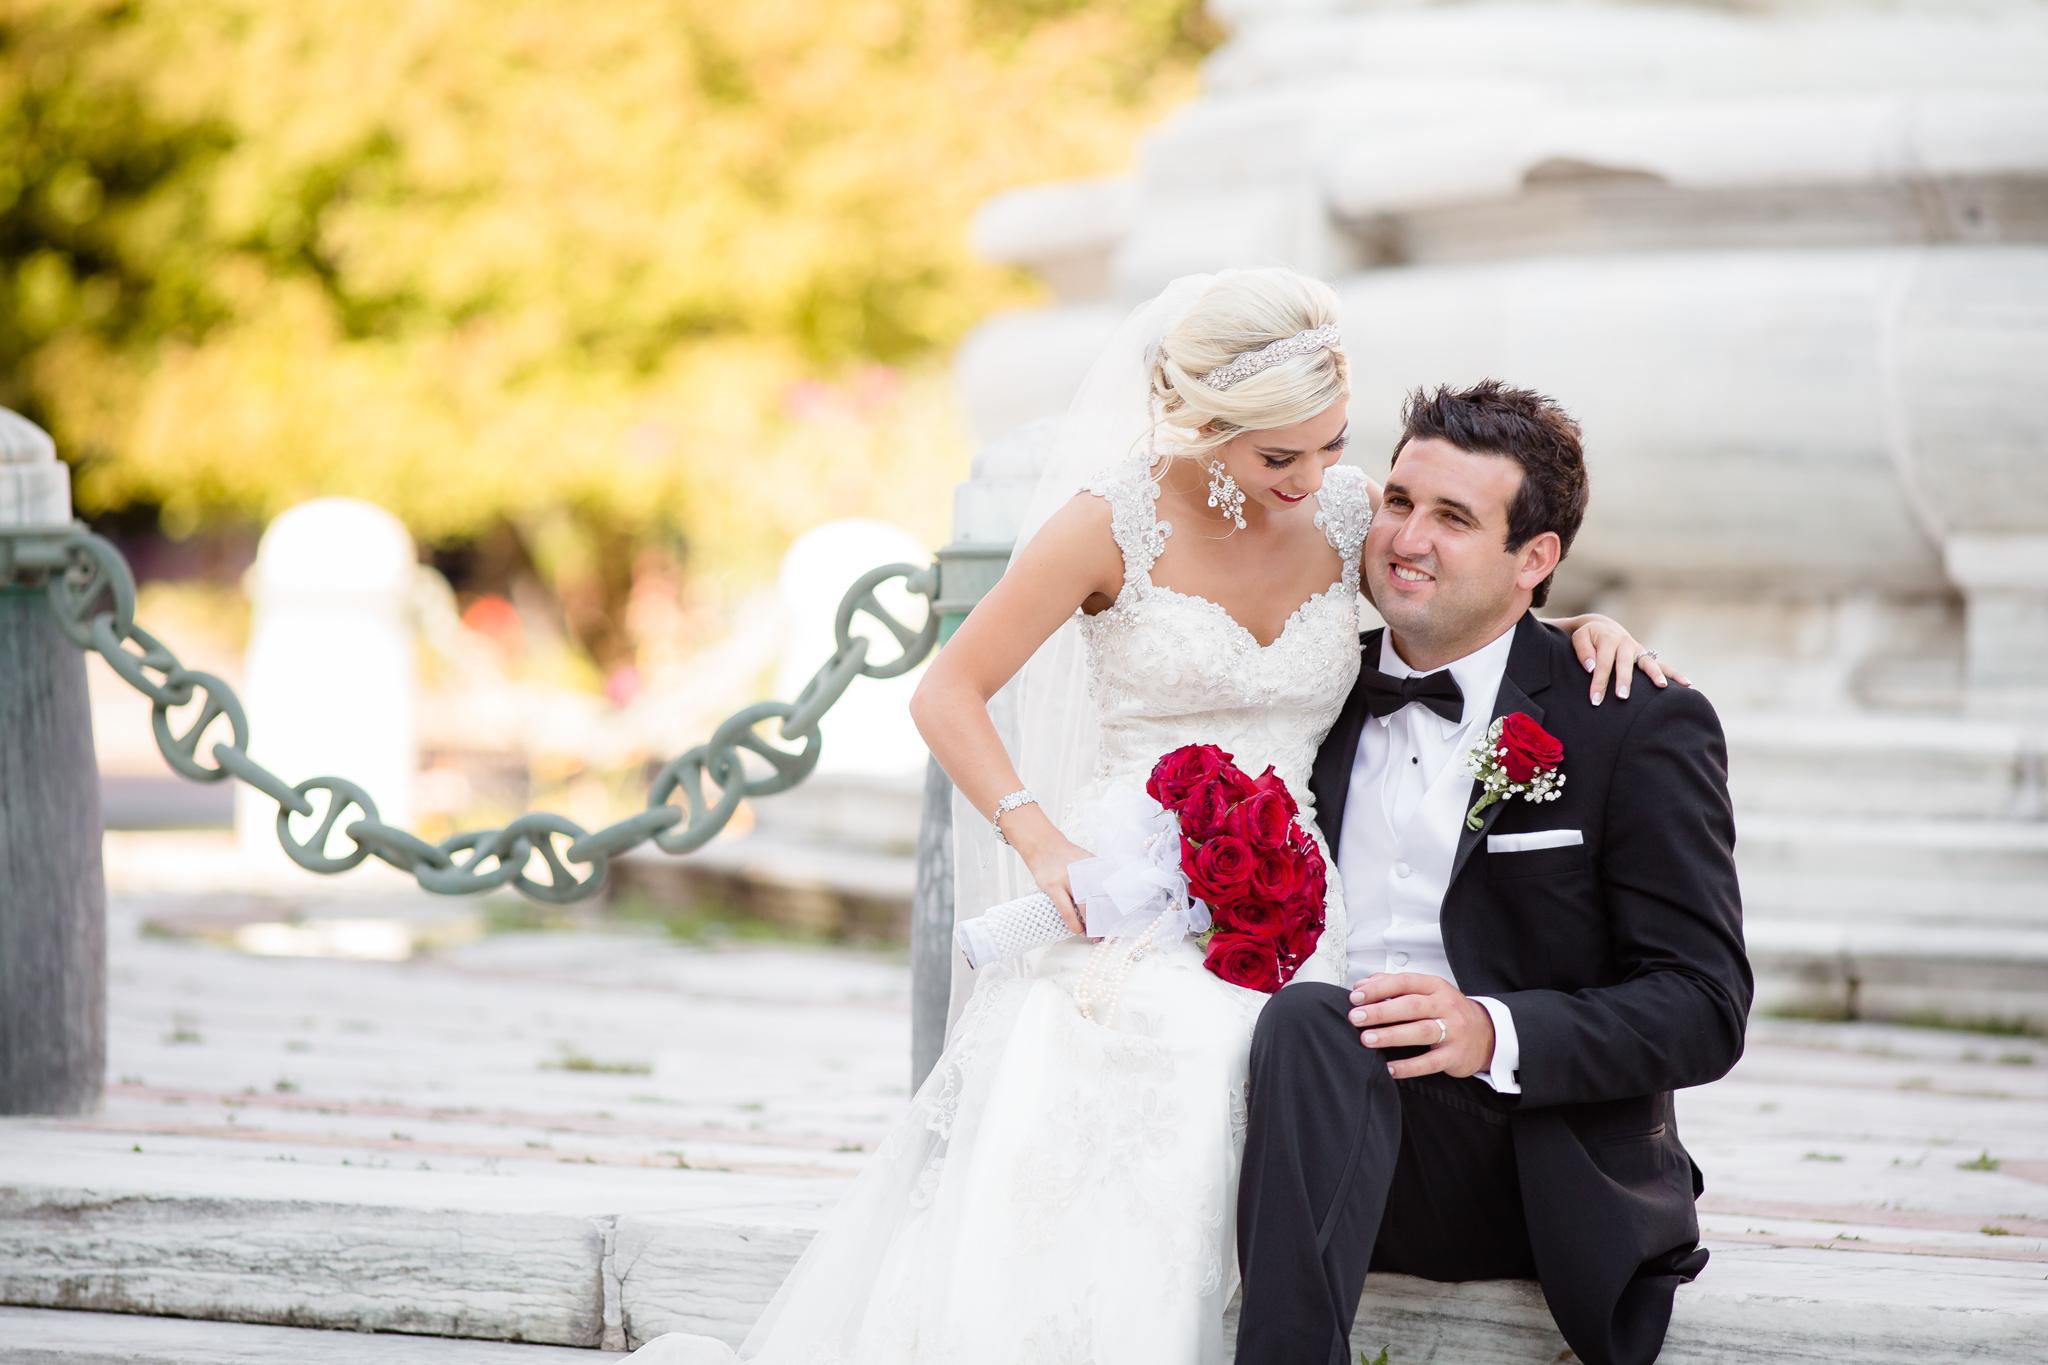 Statler-City-Buffalo-wedding-photographer- 0454.jpg